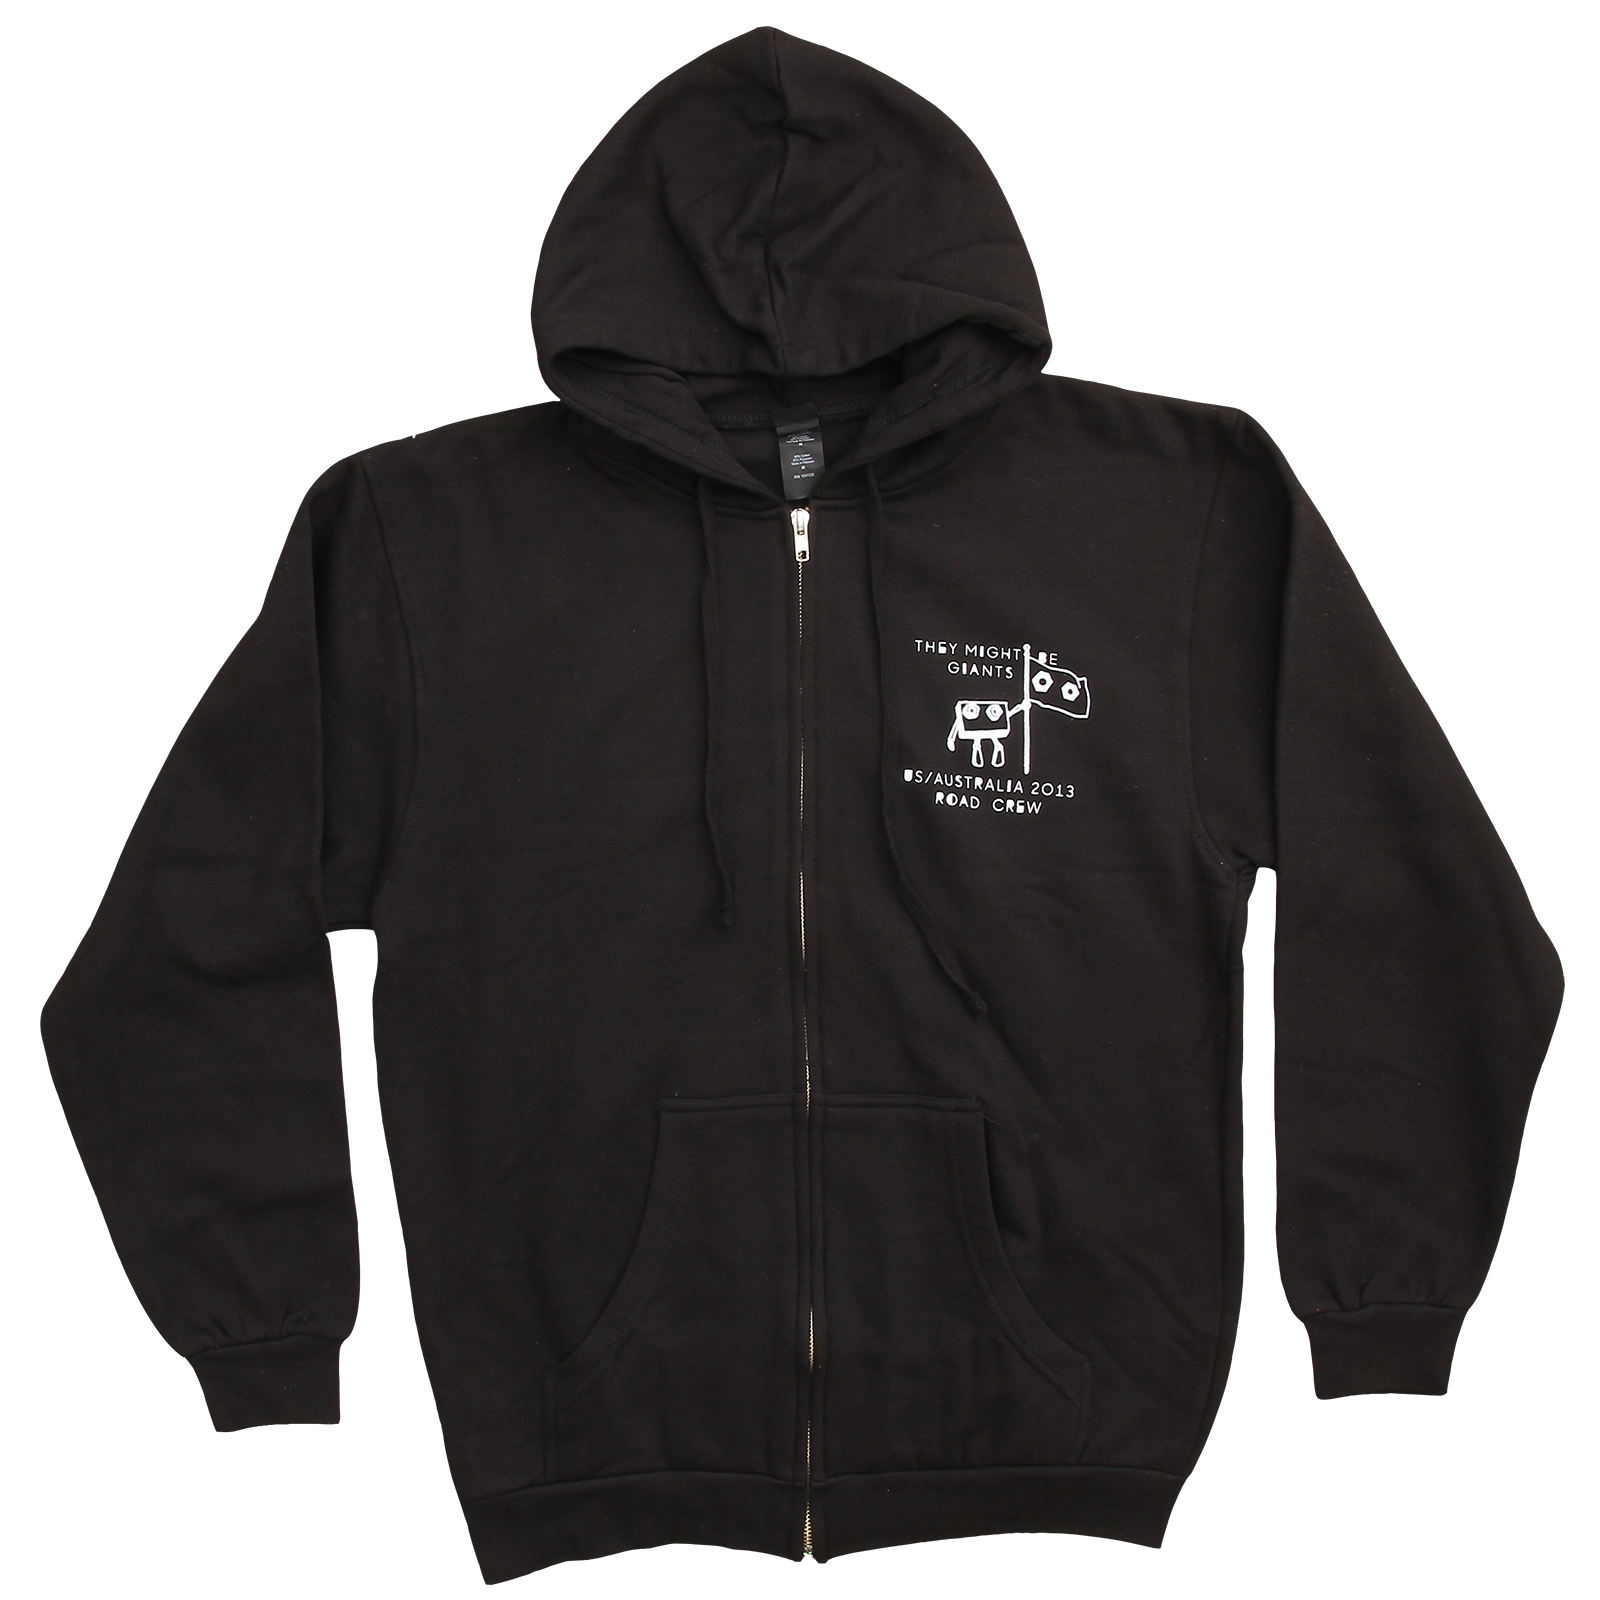 They Might Be Giants - Nanobots Zip Up Black Sweatshirt